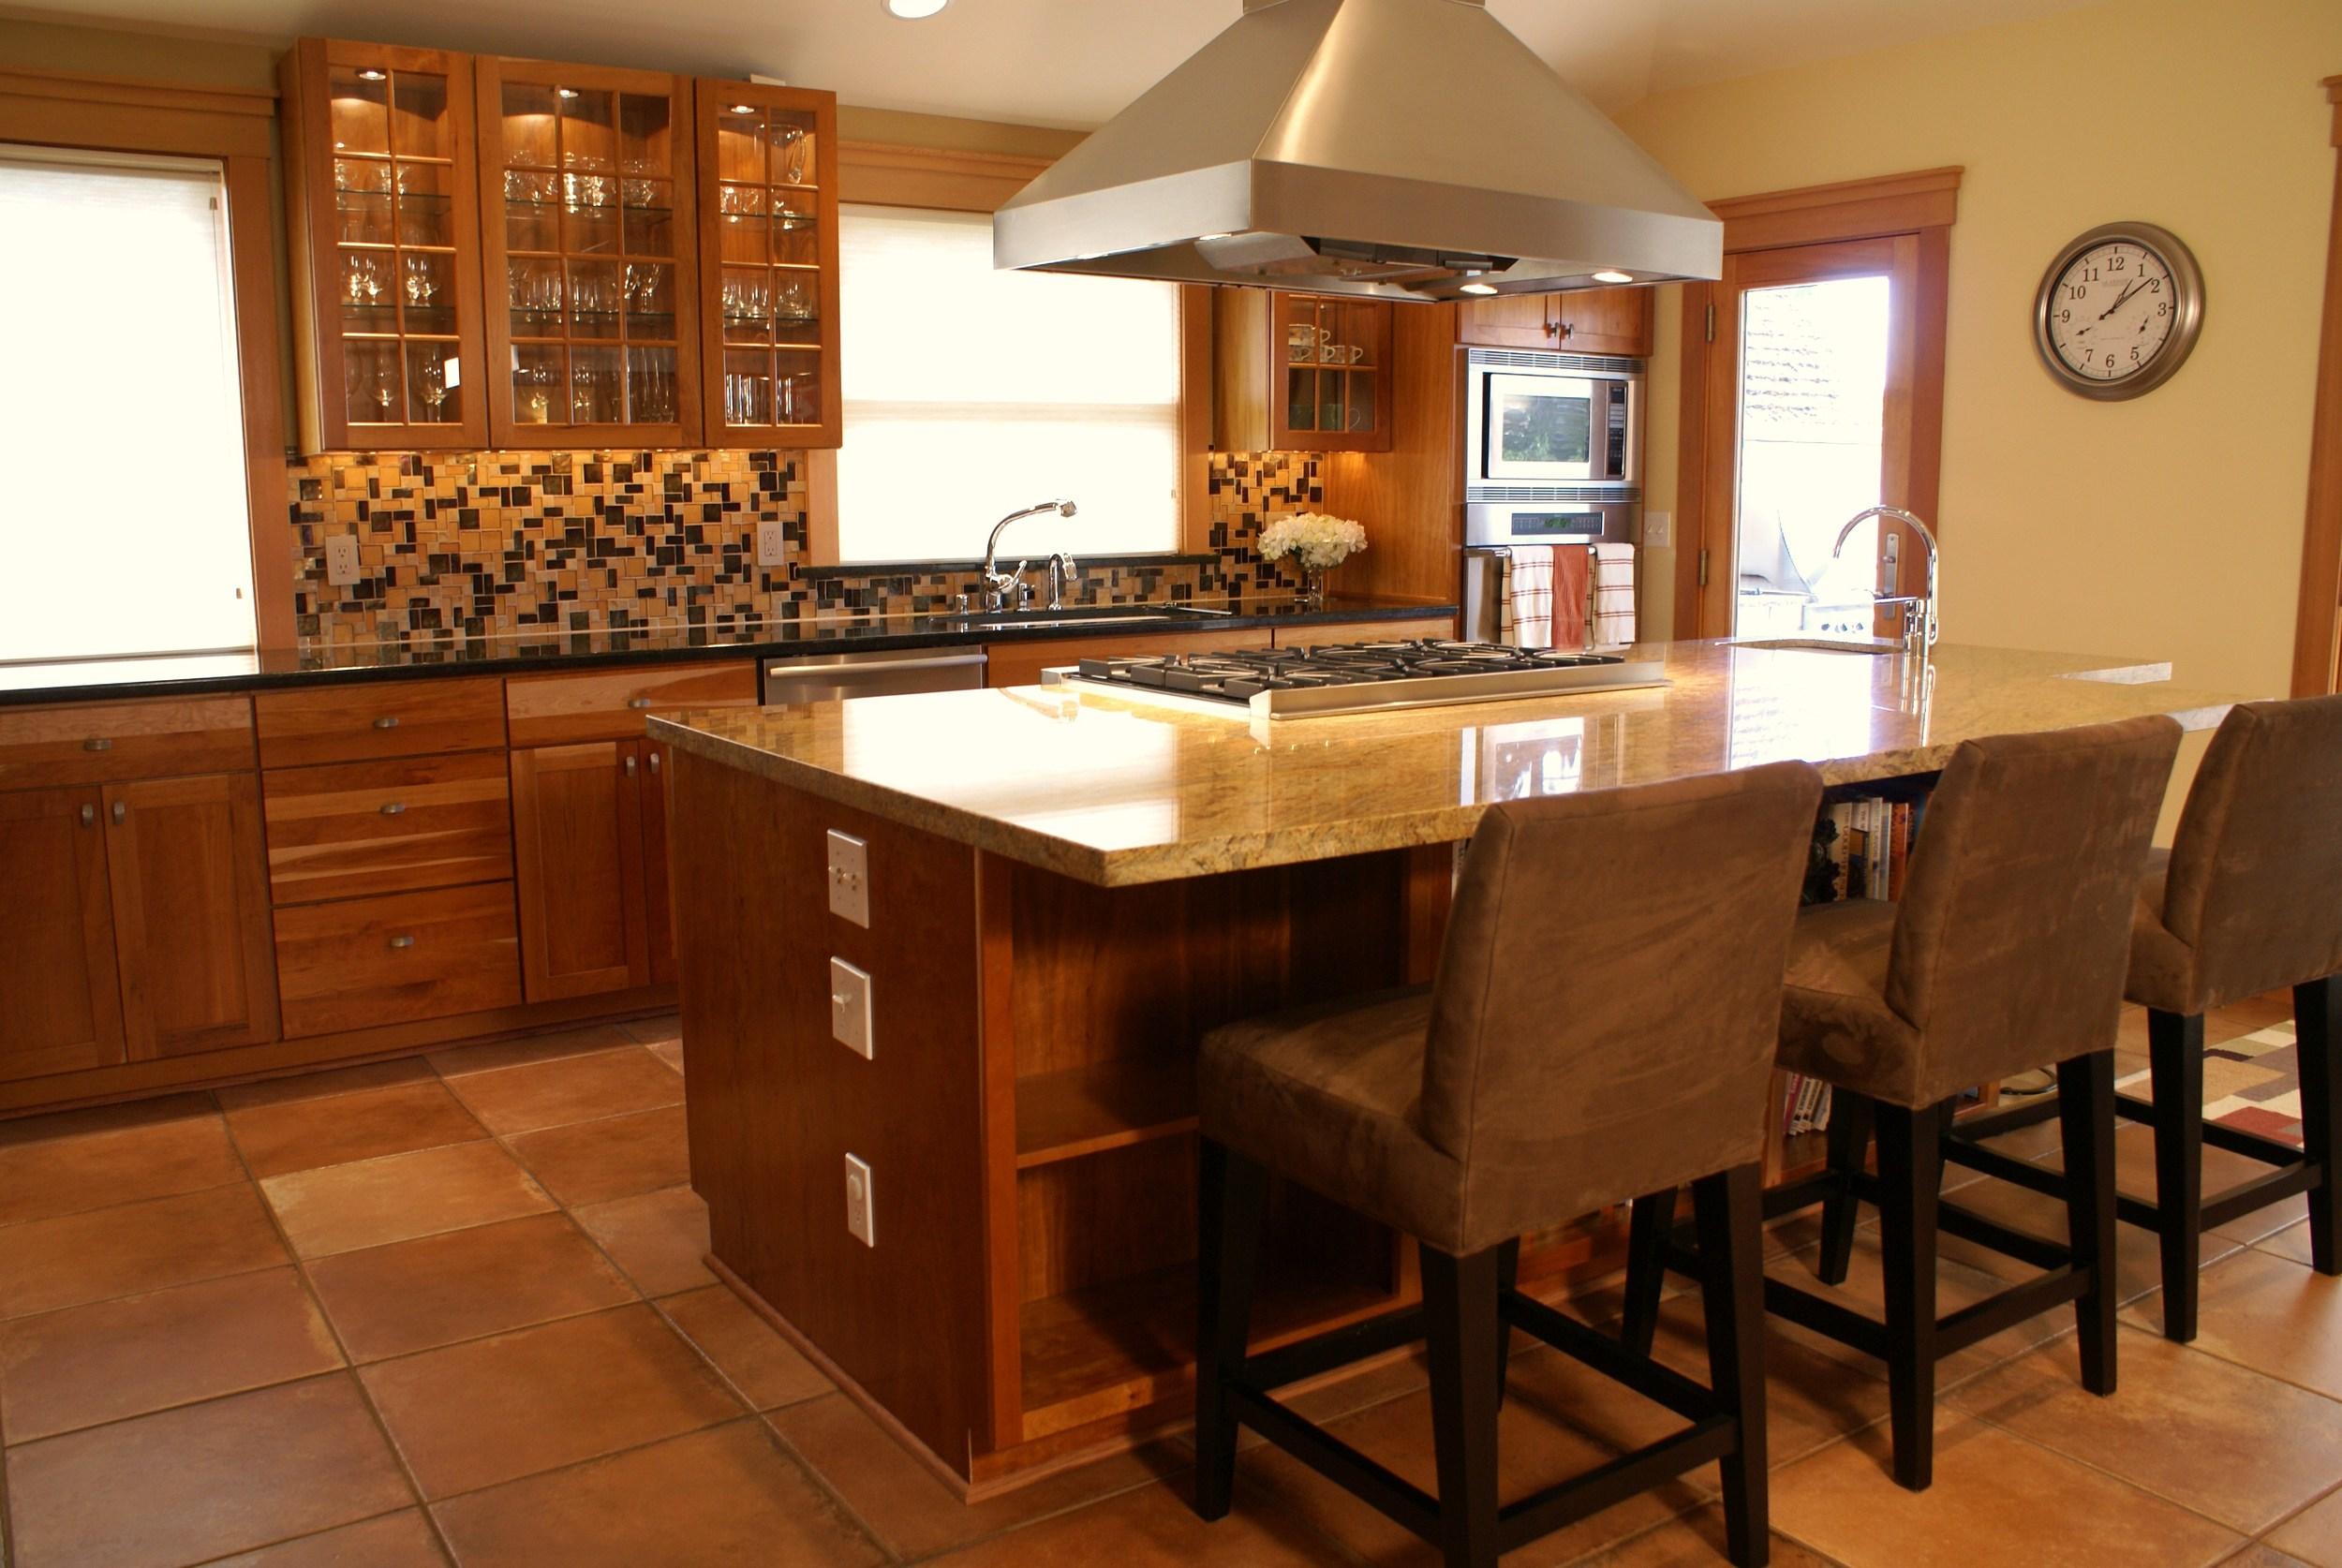 new furniture, countertop and backsplash(1).JPG